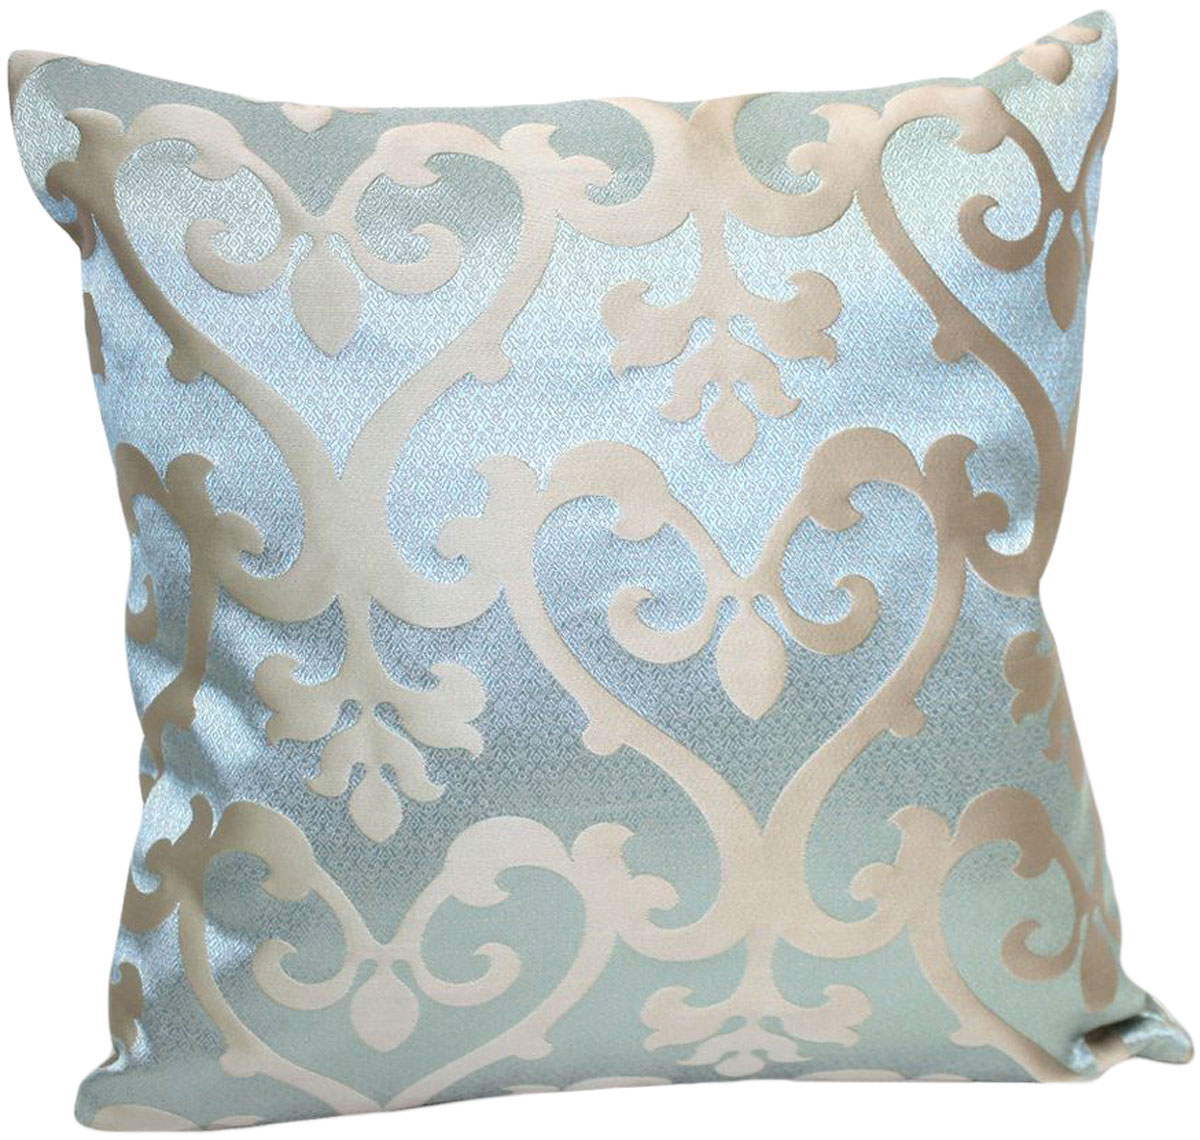 Подушка декоративная KauffOrt Флорентина, цвет: серебристый, голубой, 40 x 40 см. 3121044640 подушка декоративная kauffort рапсодия цвет бежевый серый 40 x 40 см